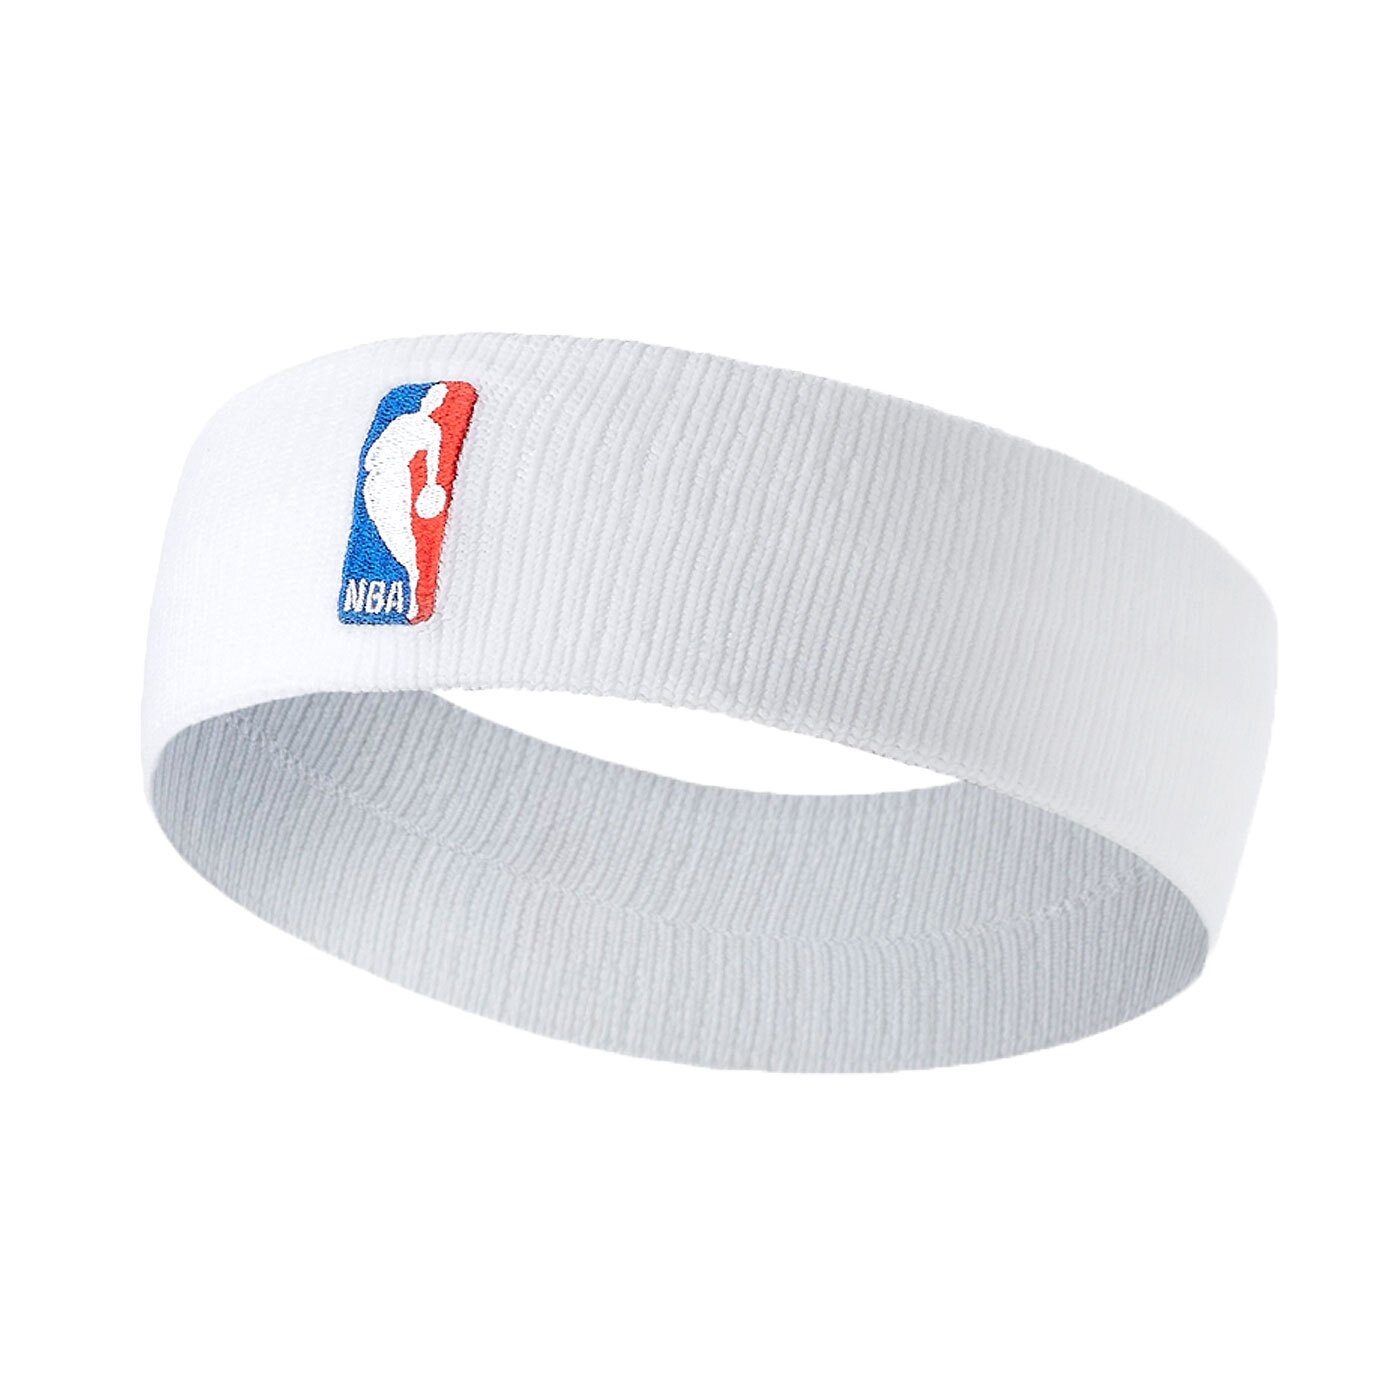 NIKE NBA DRI-FIT 單色頭帶(客場)(髮帶 慢跑 一只入 籃球 飛人喬丹【98341582】≡排汗專家≡